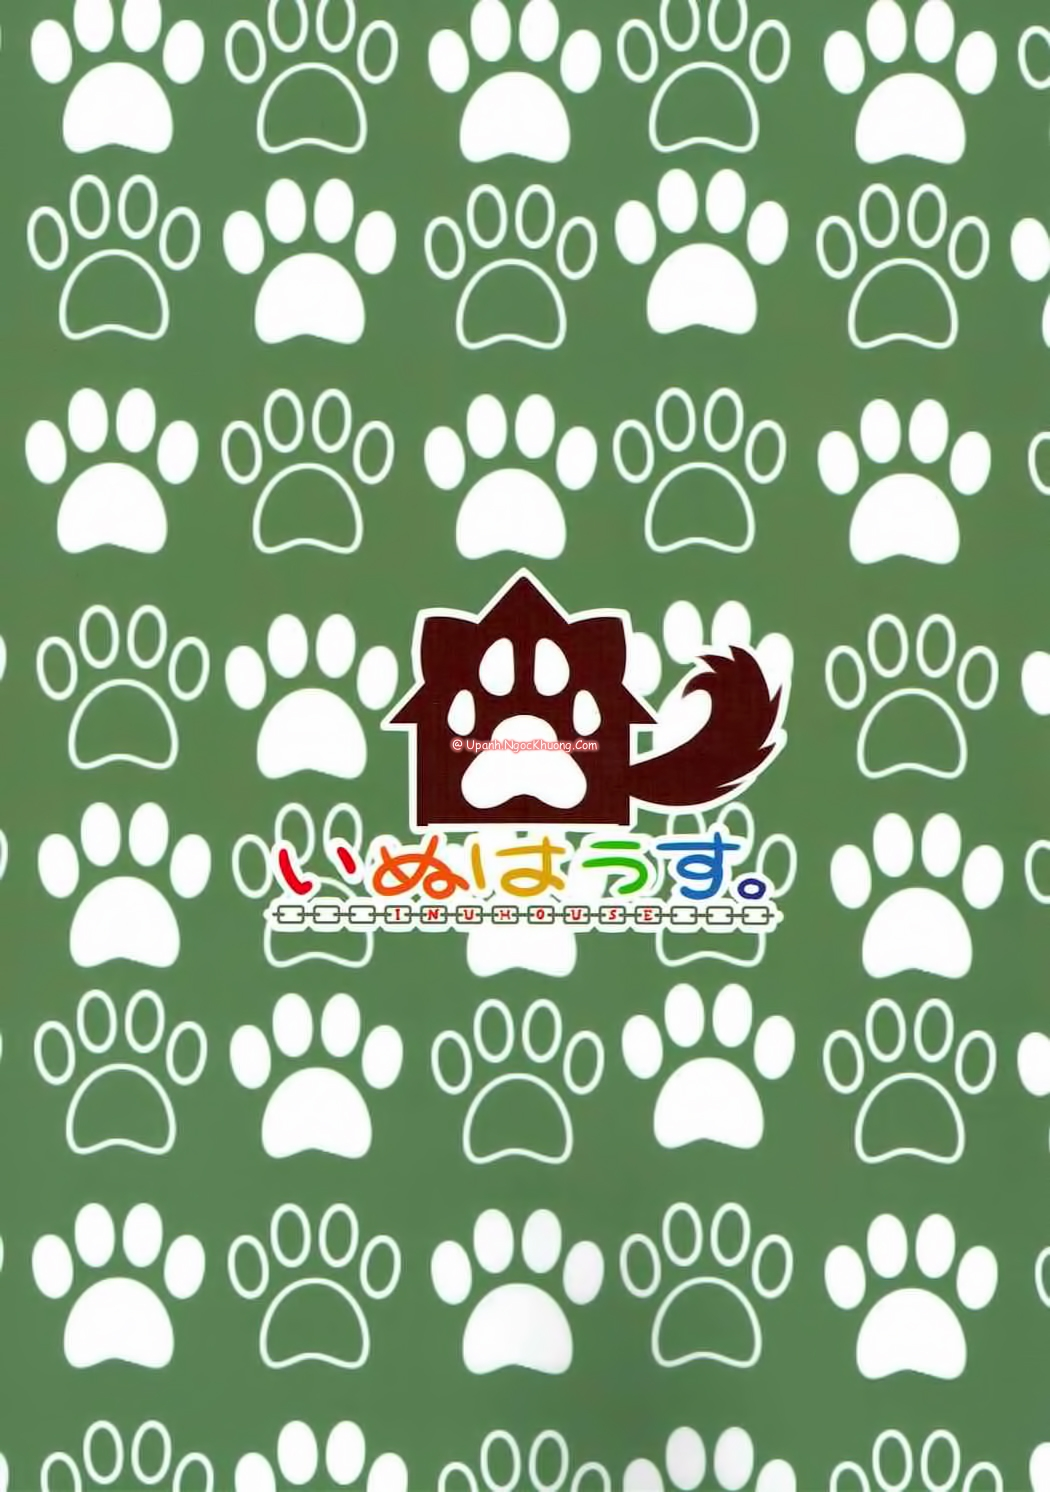 Hình ảnh 26460320338_6d35be6f79_o trong bài viết Shigure wa Ookami Zen Yamazukin-chan Ki oTsukete